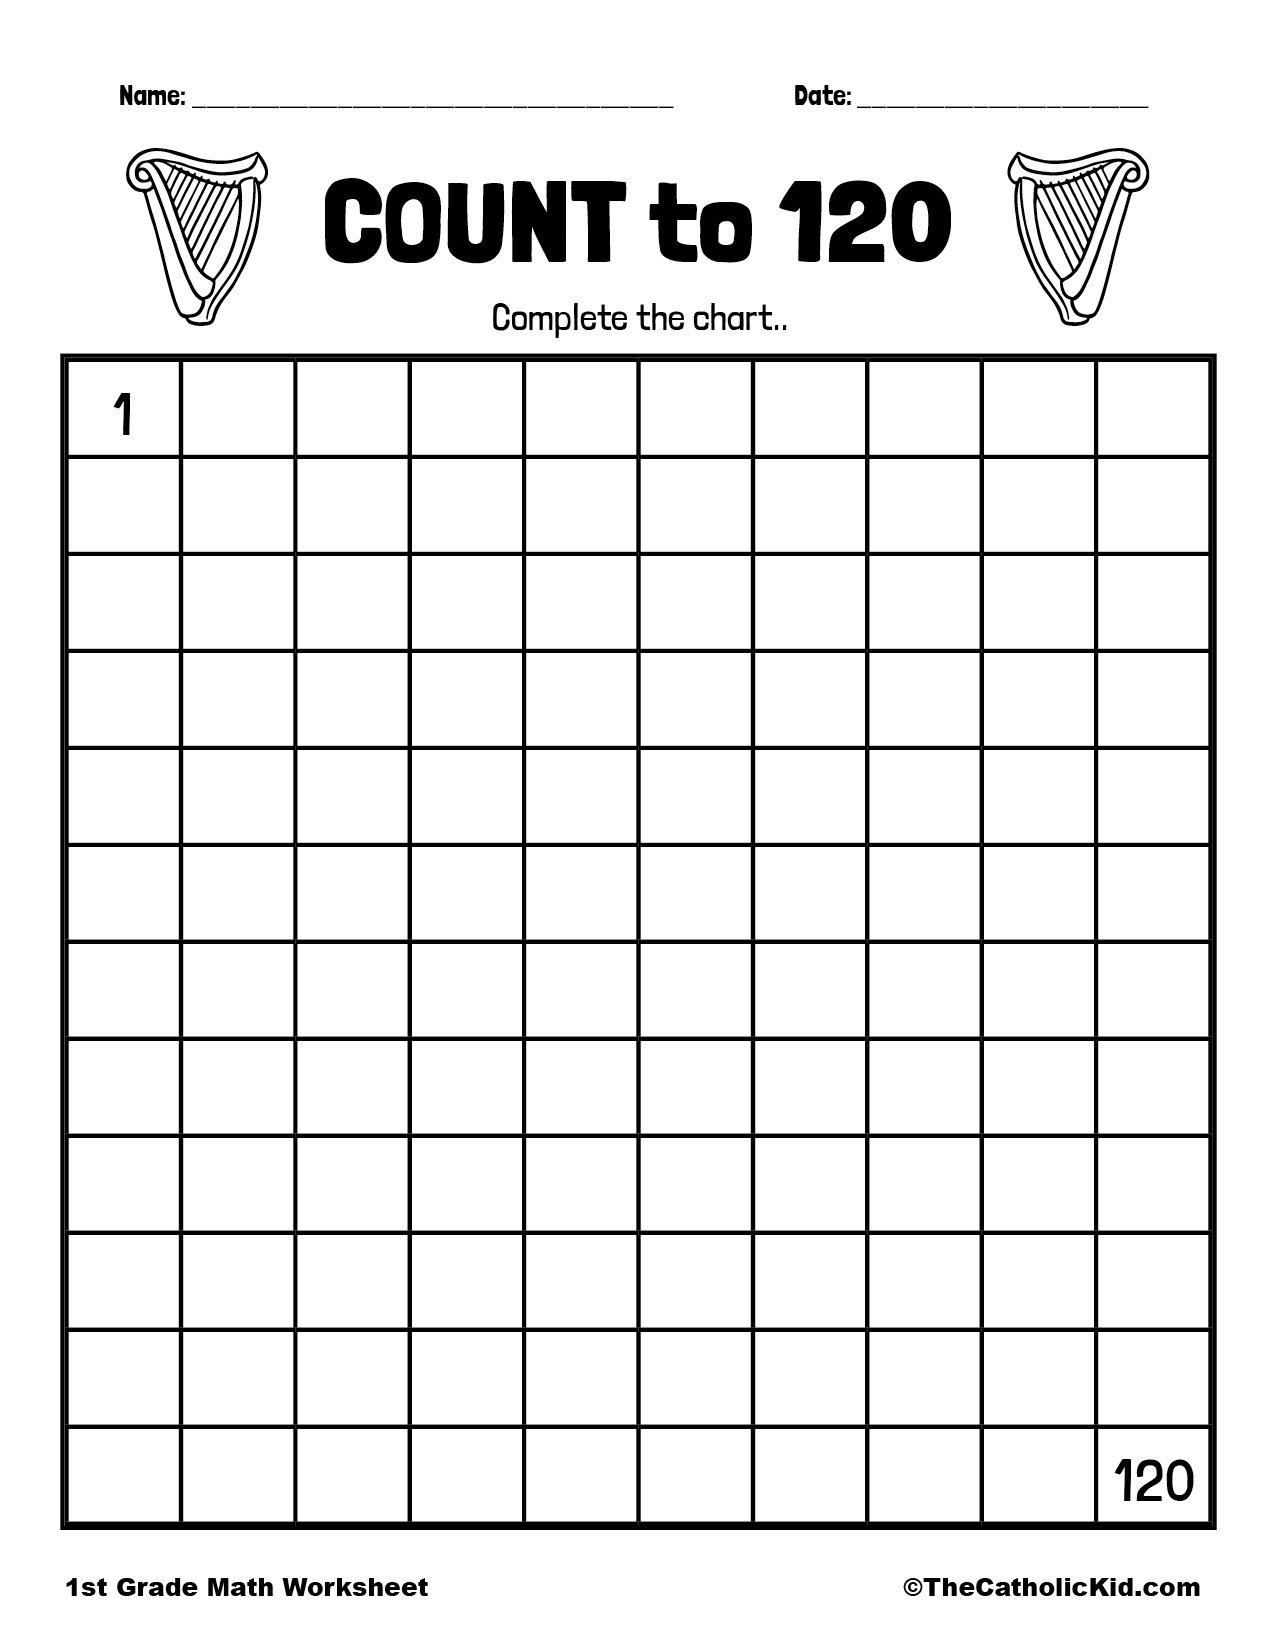 Count to 120 - 1st Grade Math Worksheet Catholic